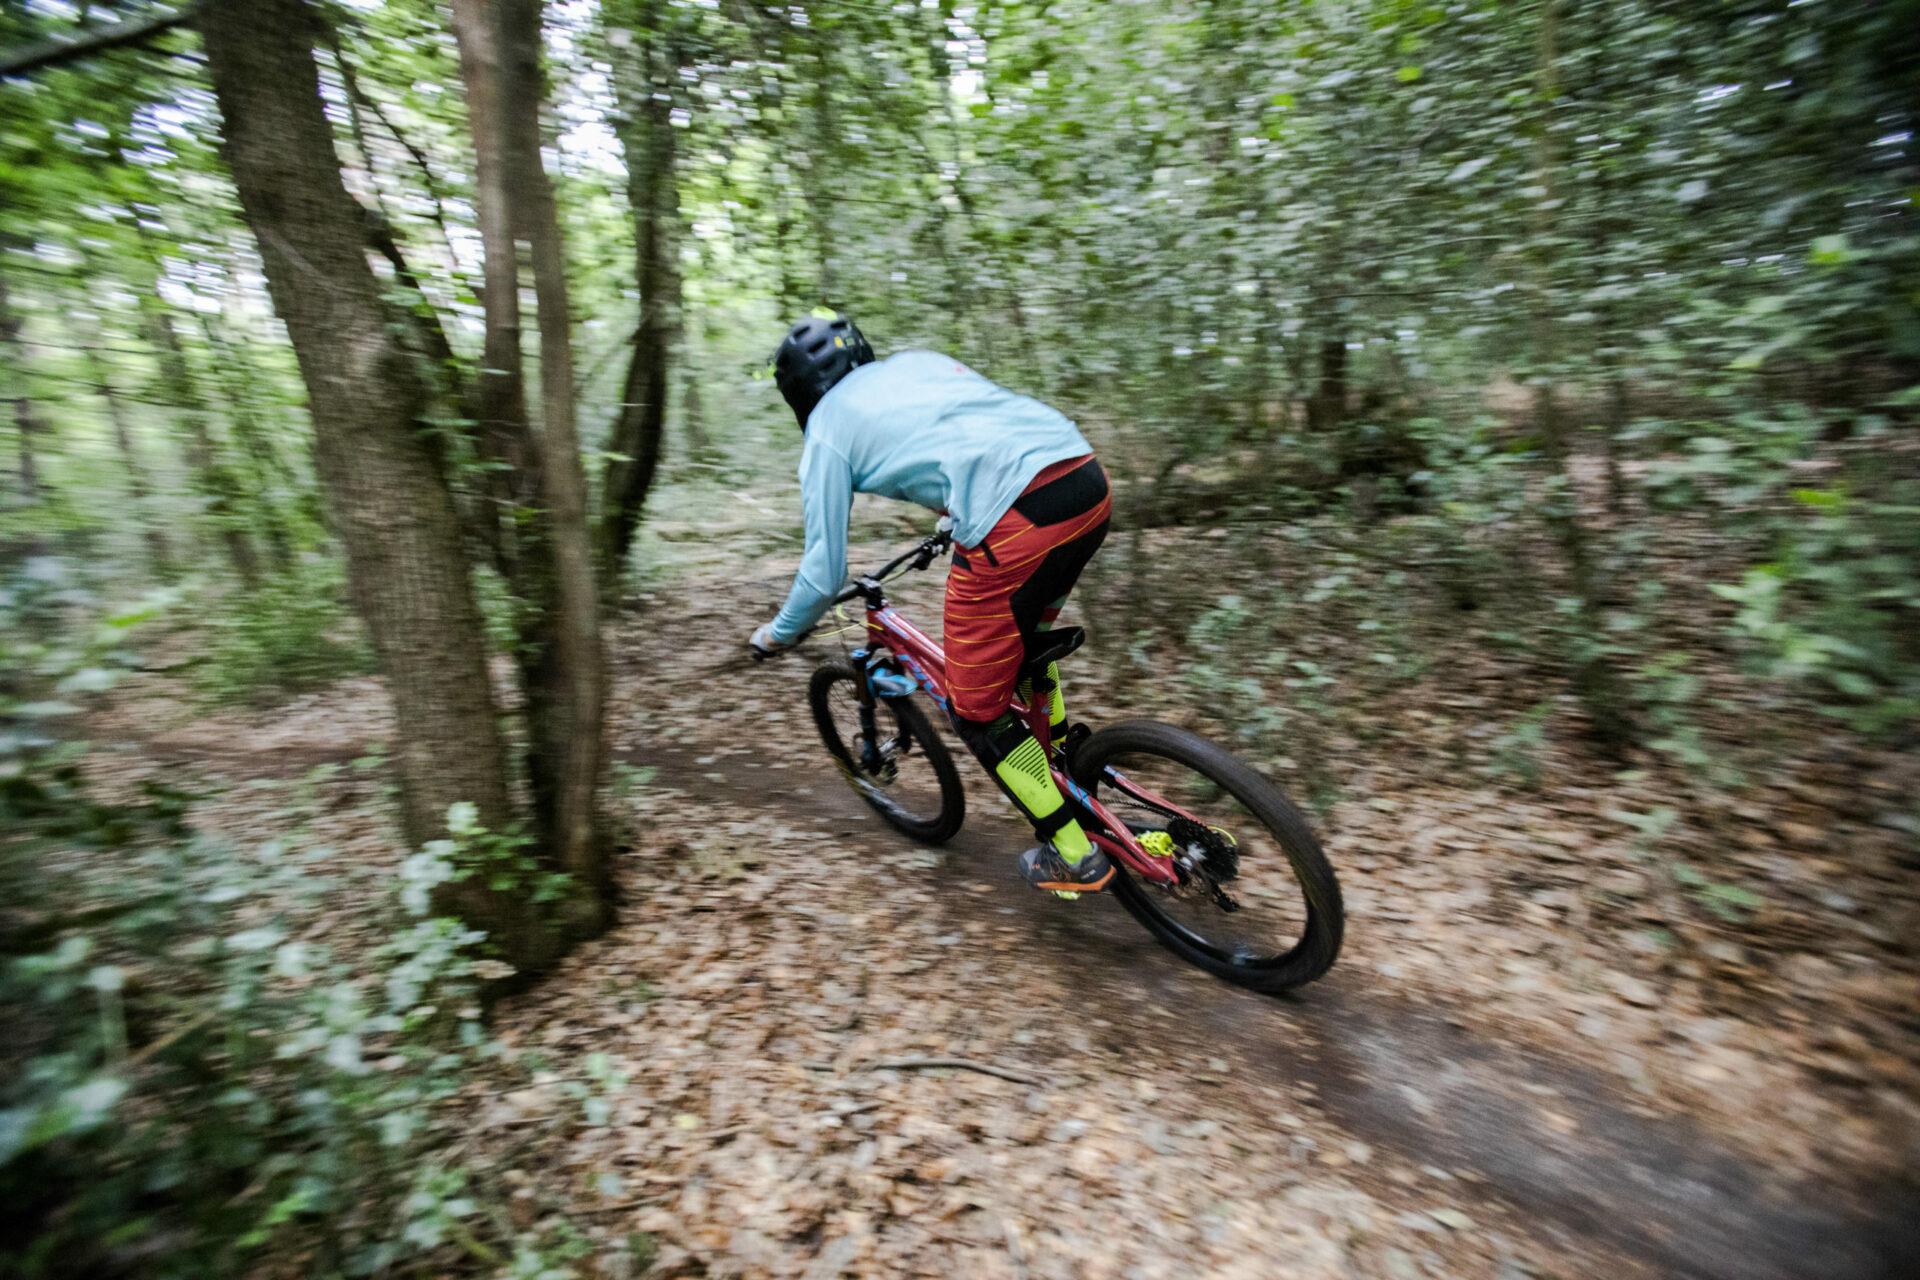 Mountainbikestrecke am Ebberg gesperrt – Stadt sucht legale Alternative